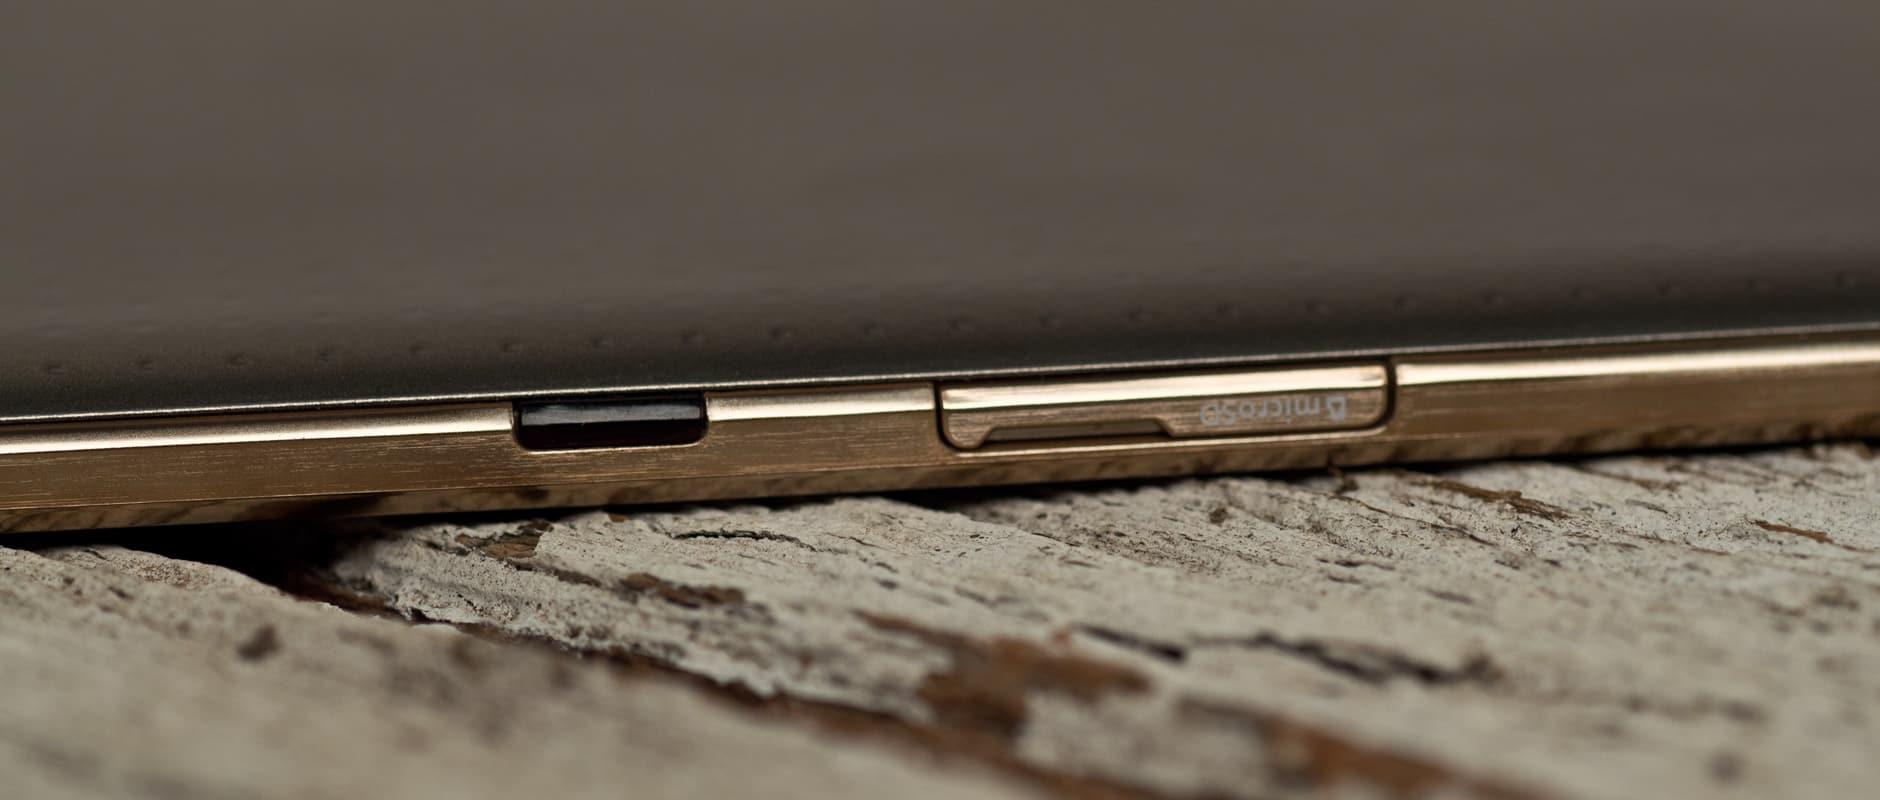 A photograph of the Samsung Galaxy Tab S 8.4's microSD slot.